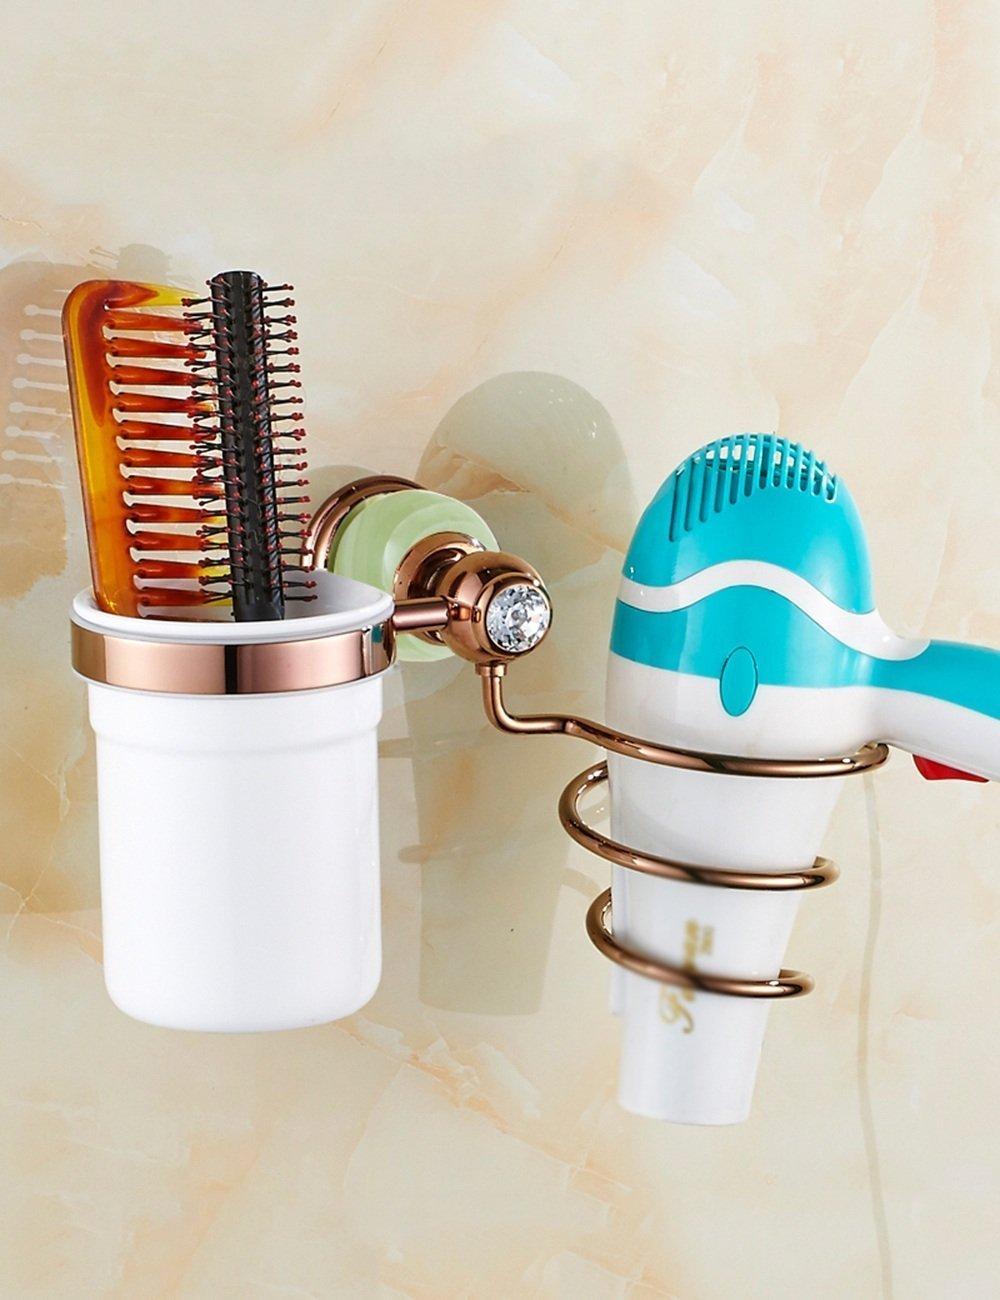 The Racks Europe style room bathroom hairdryer Copper Gold Rack Hairdryer ( color: Size: 1 , B )